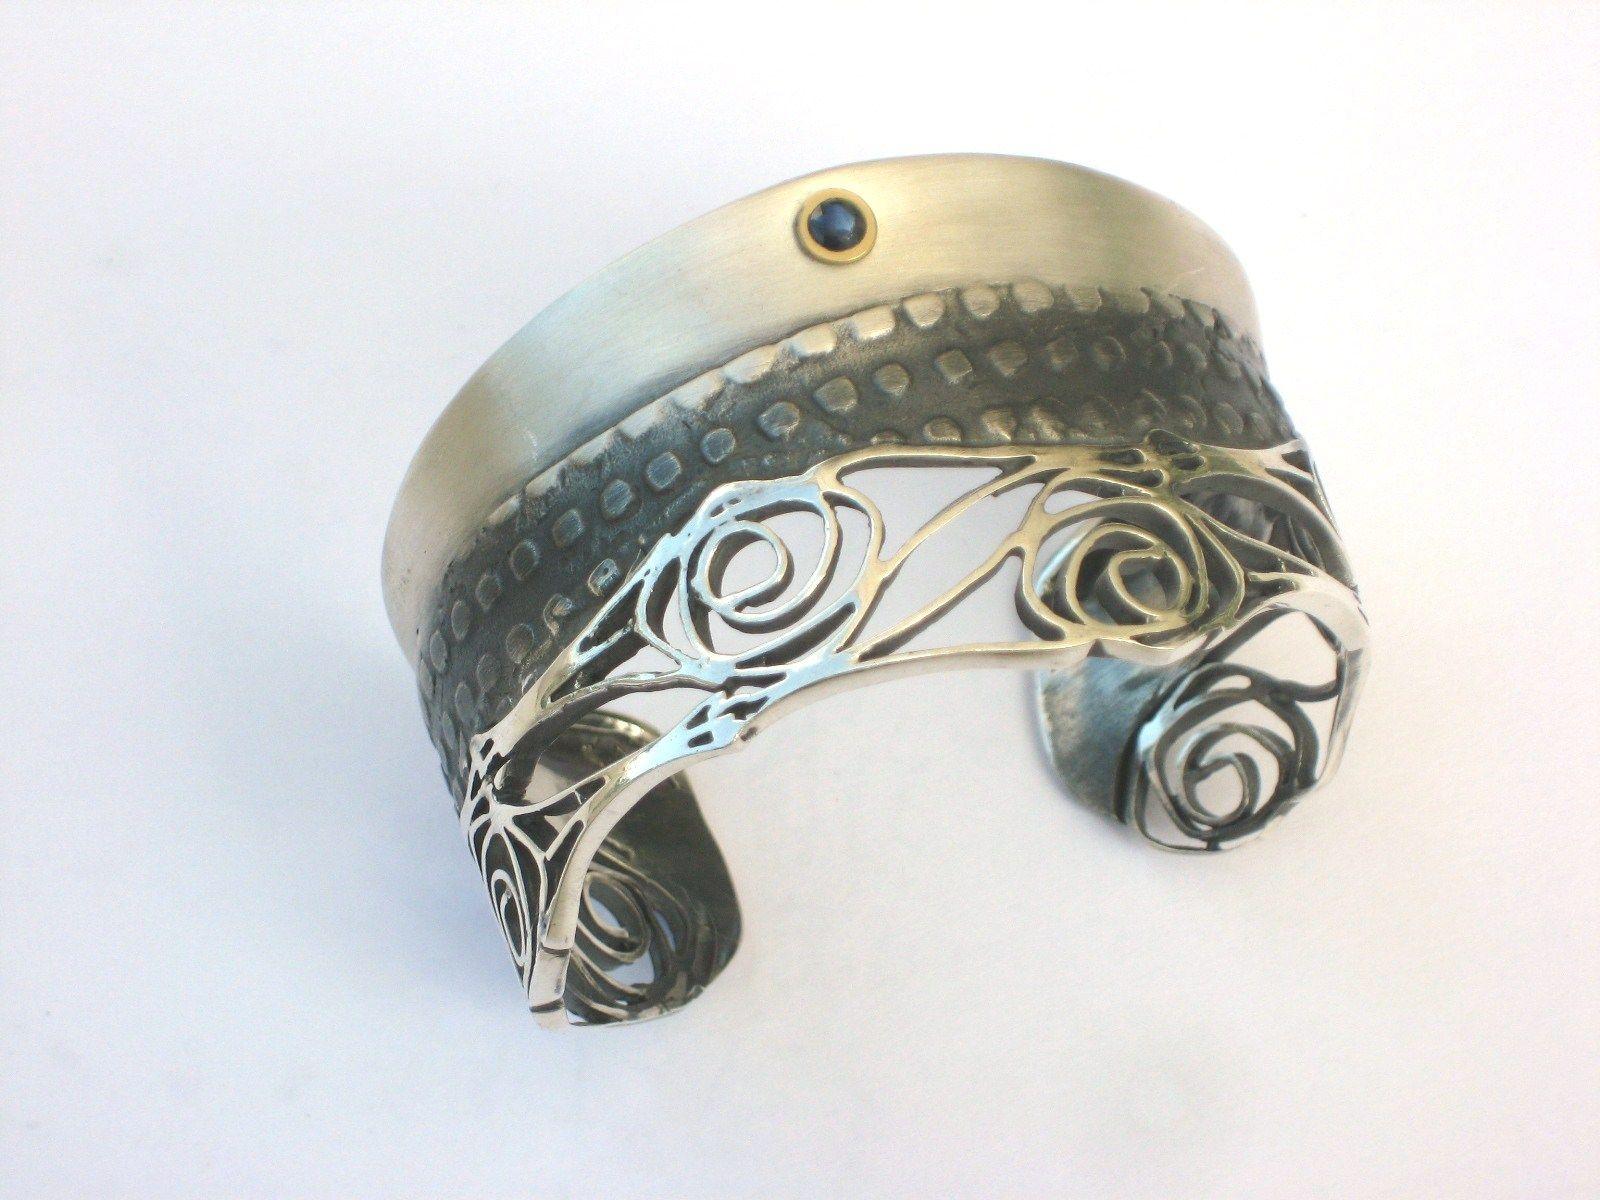 Modern take on art nouveau inspired bracelet cuff sterling silver